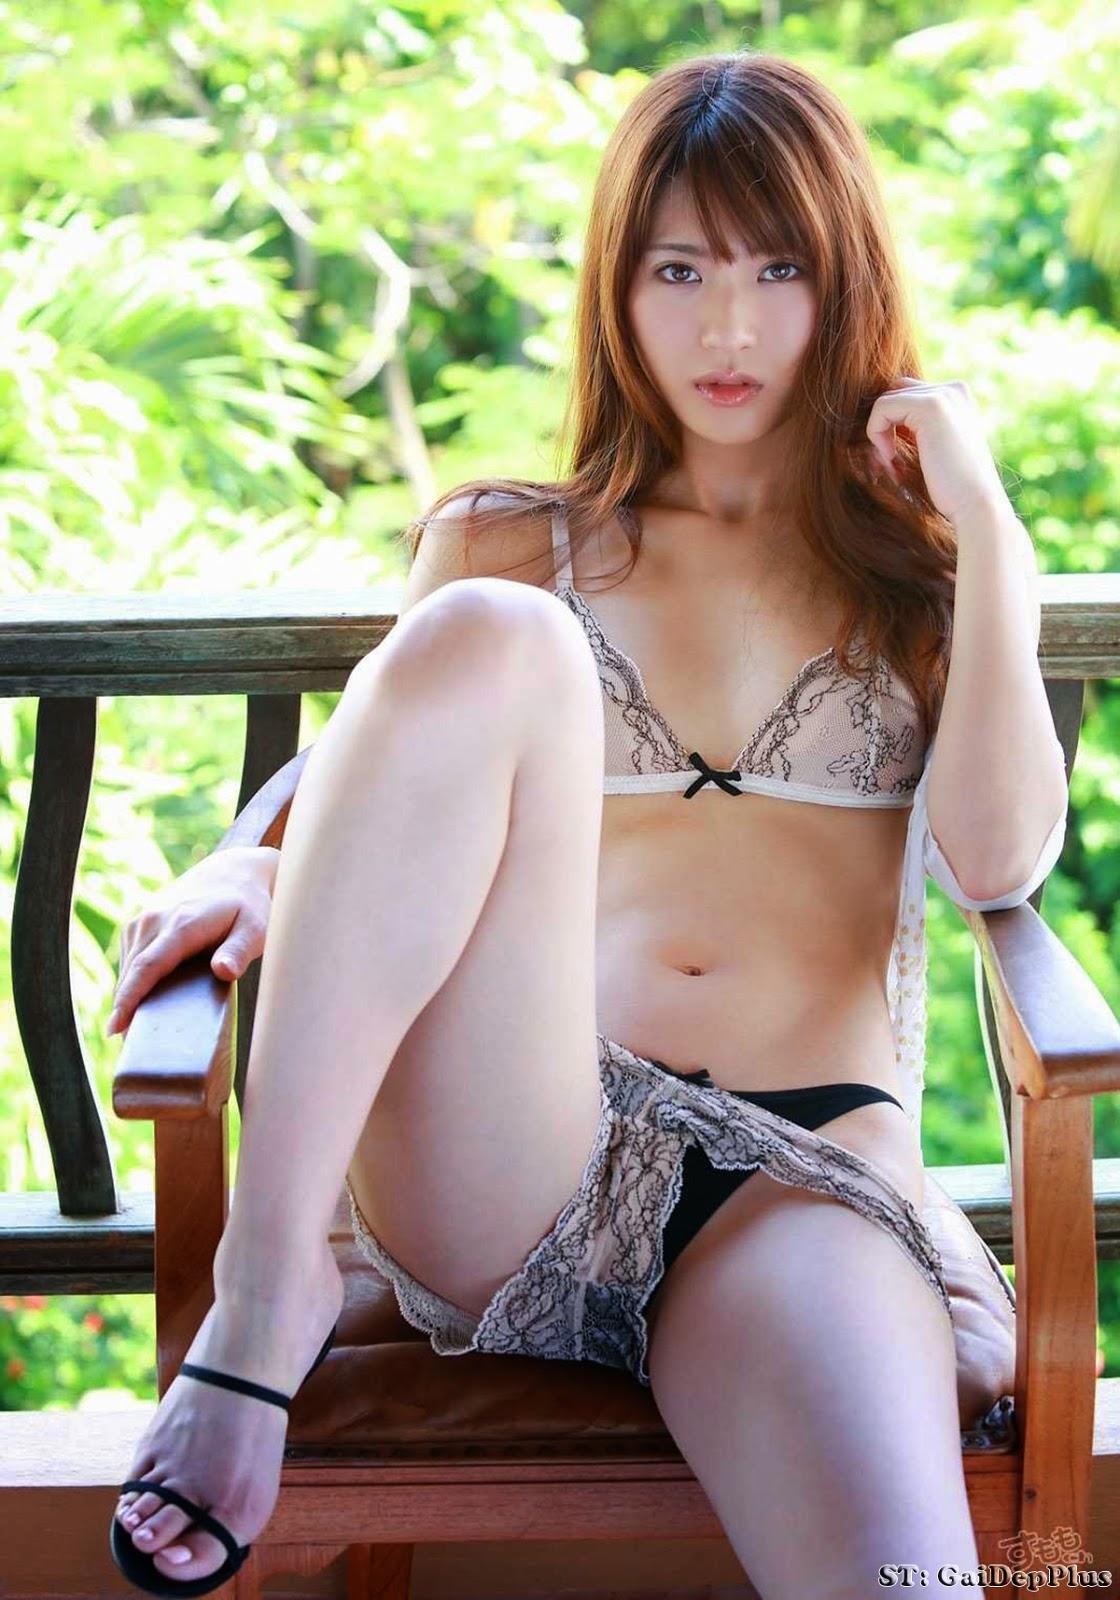 Saki Yamaguchi showing hot body | Beautiful Girl